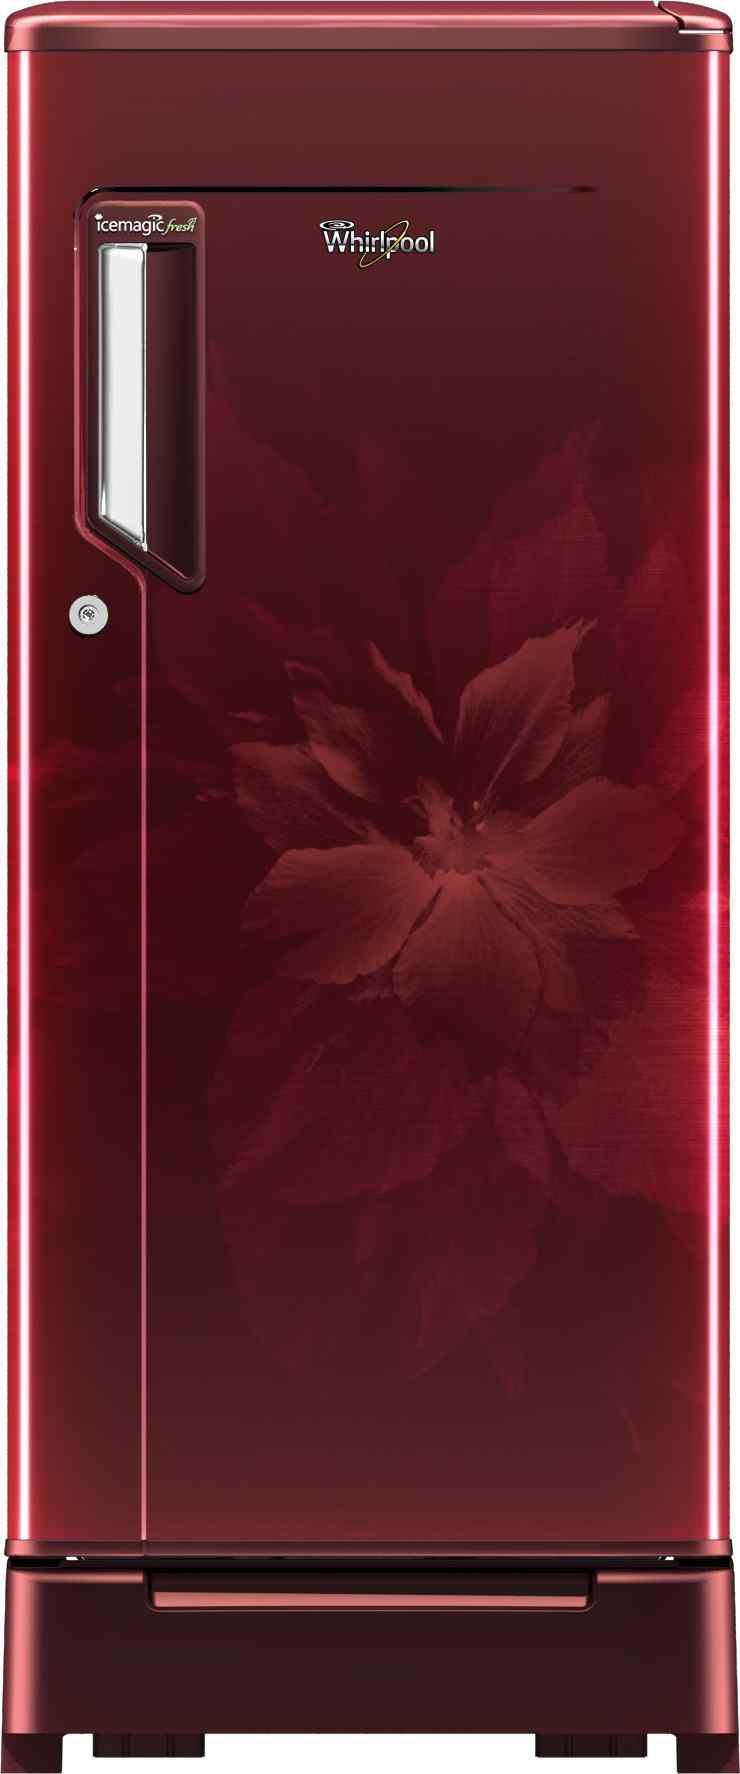 Best price on Whirlpool 230 IMFRESH ROY 5S (Regalia) 215 L Single Door Refrigerator in India